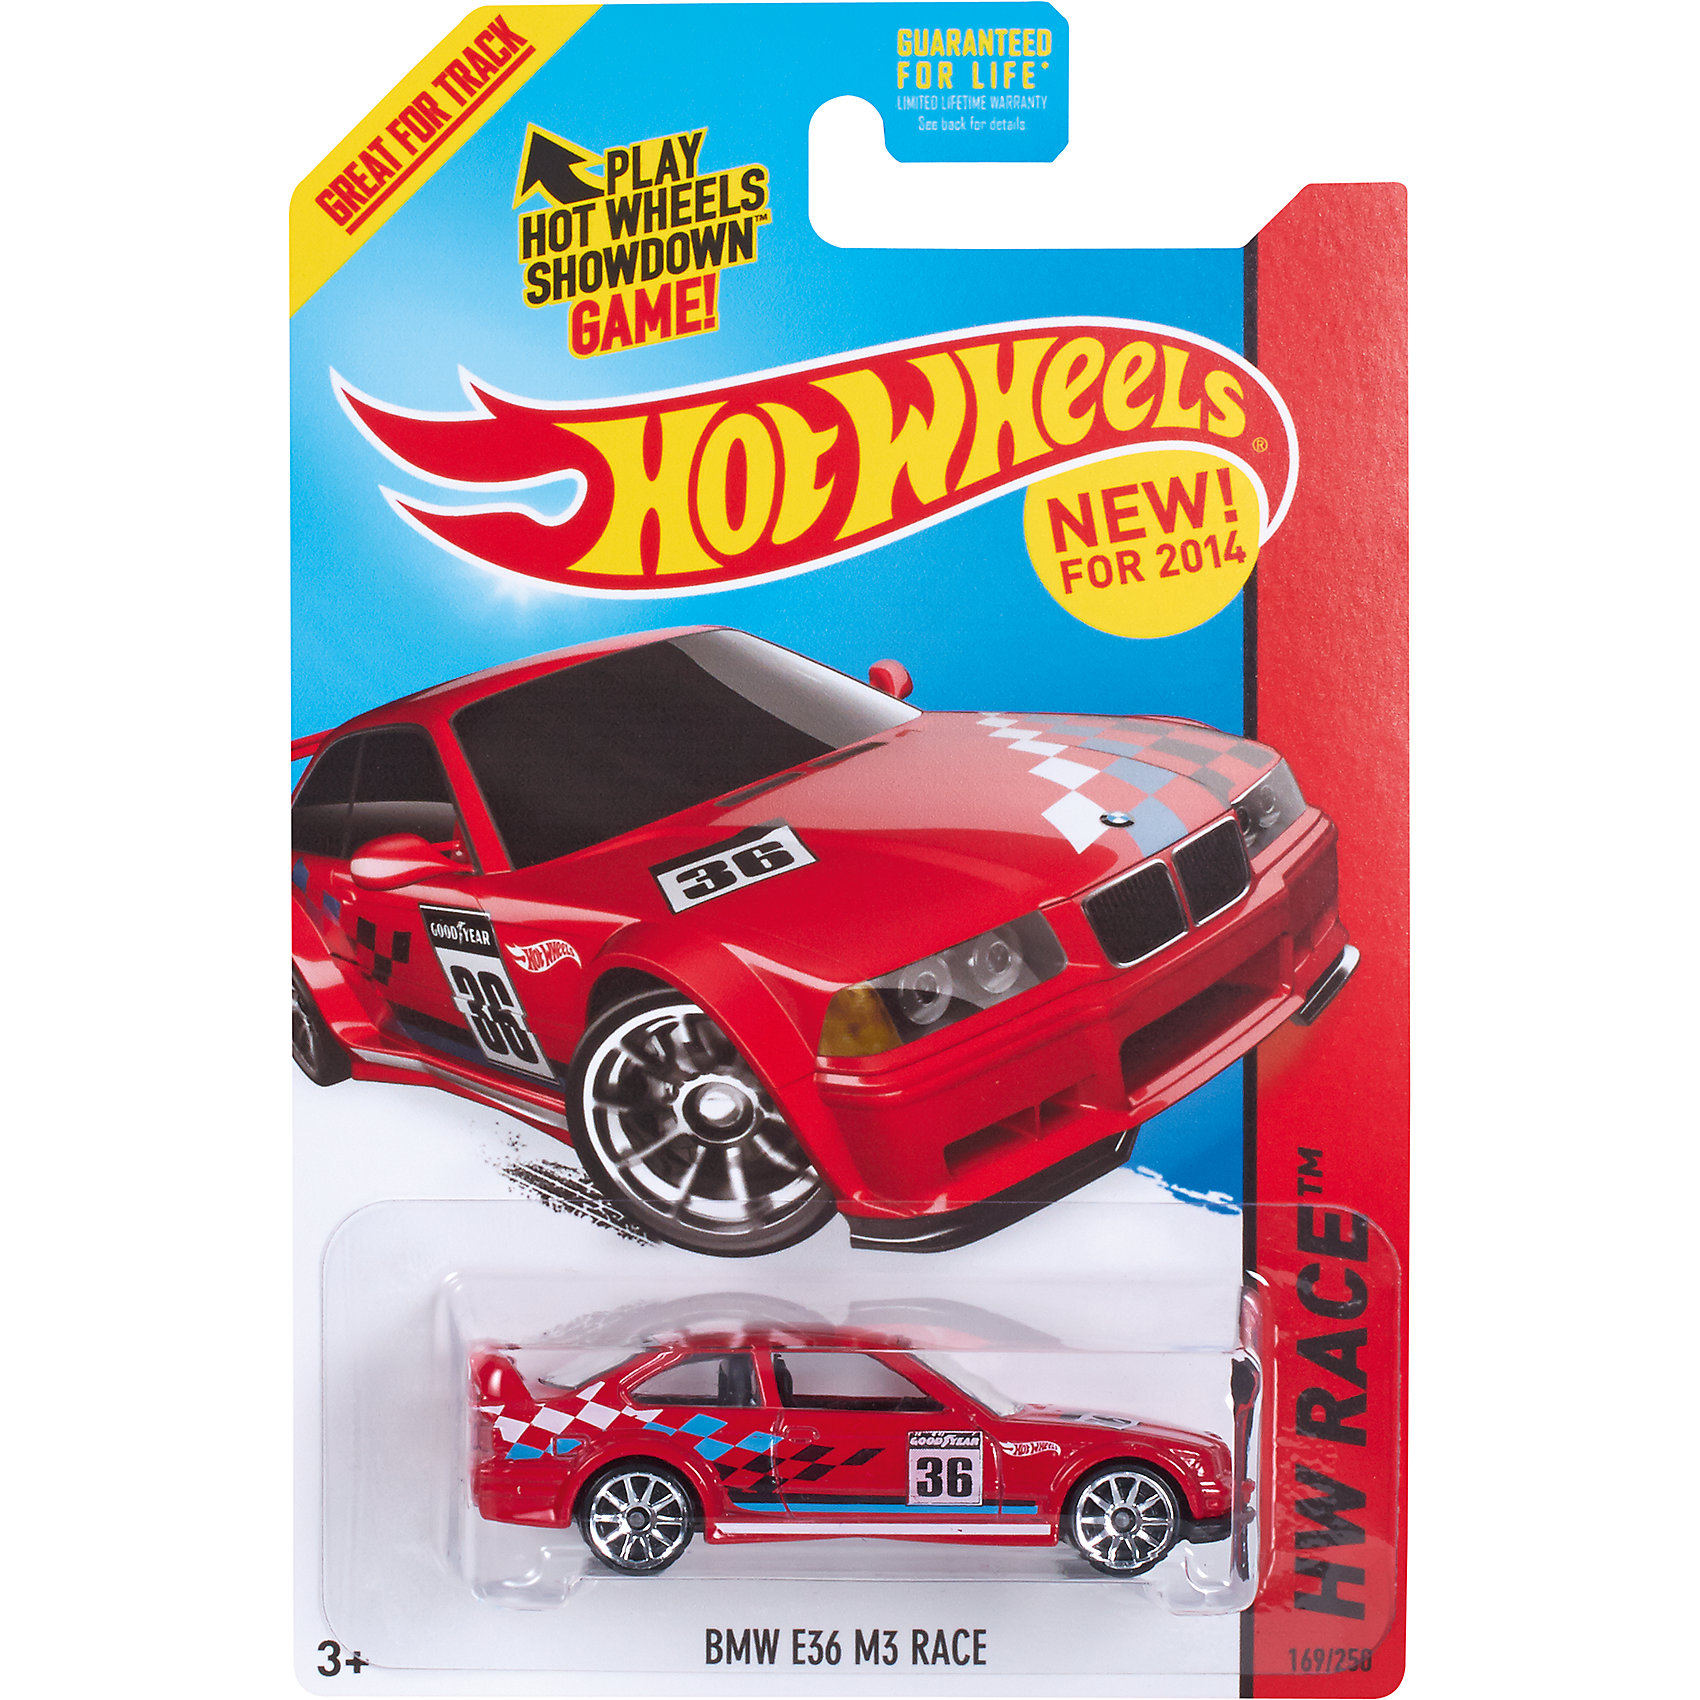 Базовая машинка Hot Wheels, BMW E36 M3 RaceМашинки<br><br><br>Ширина мм: 110<br>Глубина мм: 45<br>Высота мм: 110<br>Вес г: 30<br>Возраст от месяцев: 36<br>Возраст до месяцев: 96<br>Пол: Мужской<br>Возраст: Детский<br>SKU: 7111907